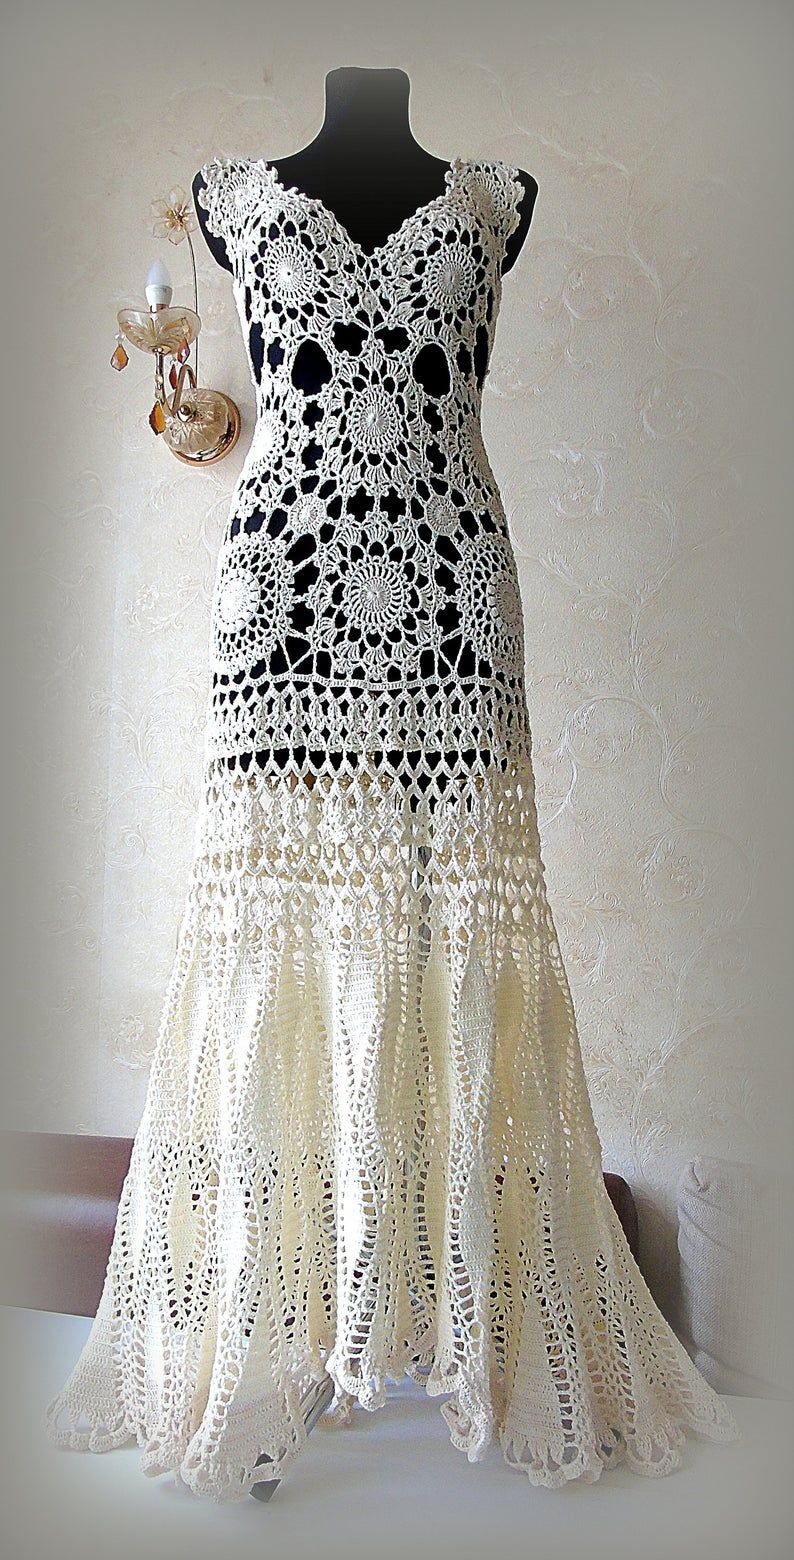 Wedding dress Custom crochet wedding dress ivory lace